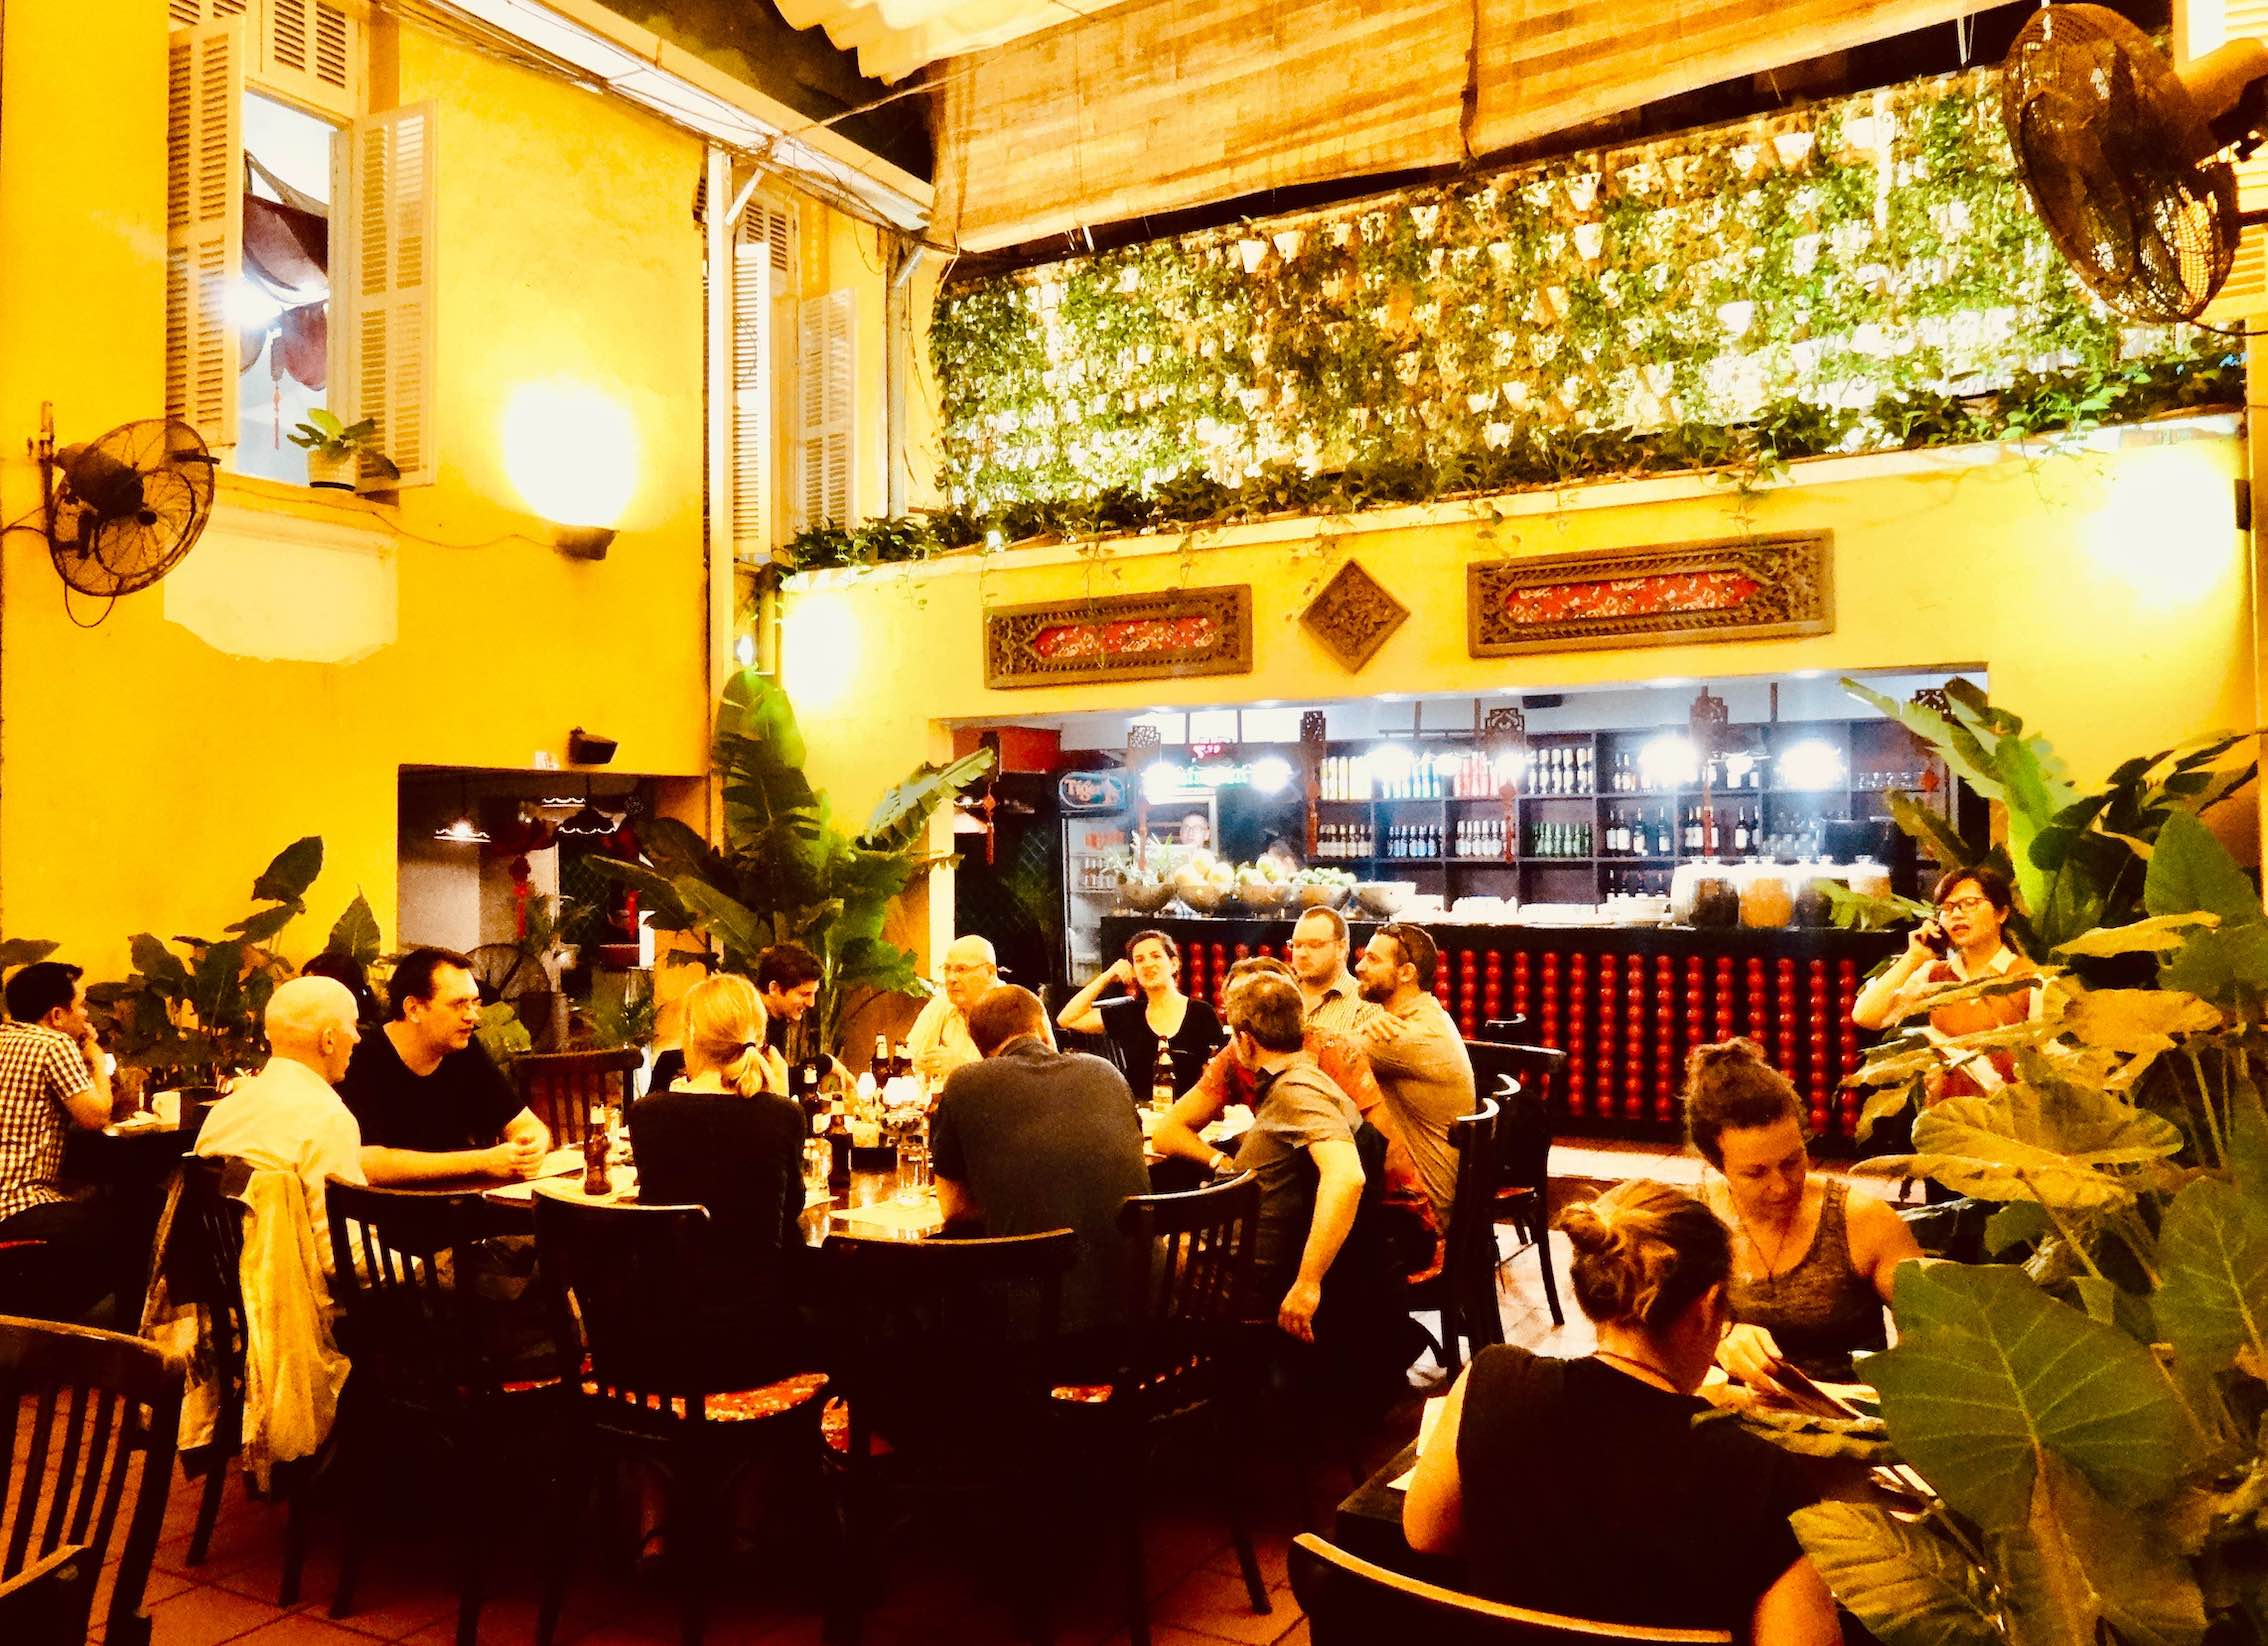 Nha Hang Ngon Restaurant Cool Spots Around Hanoi